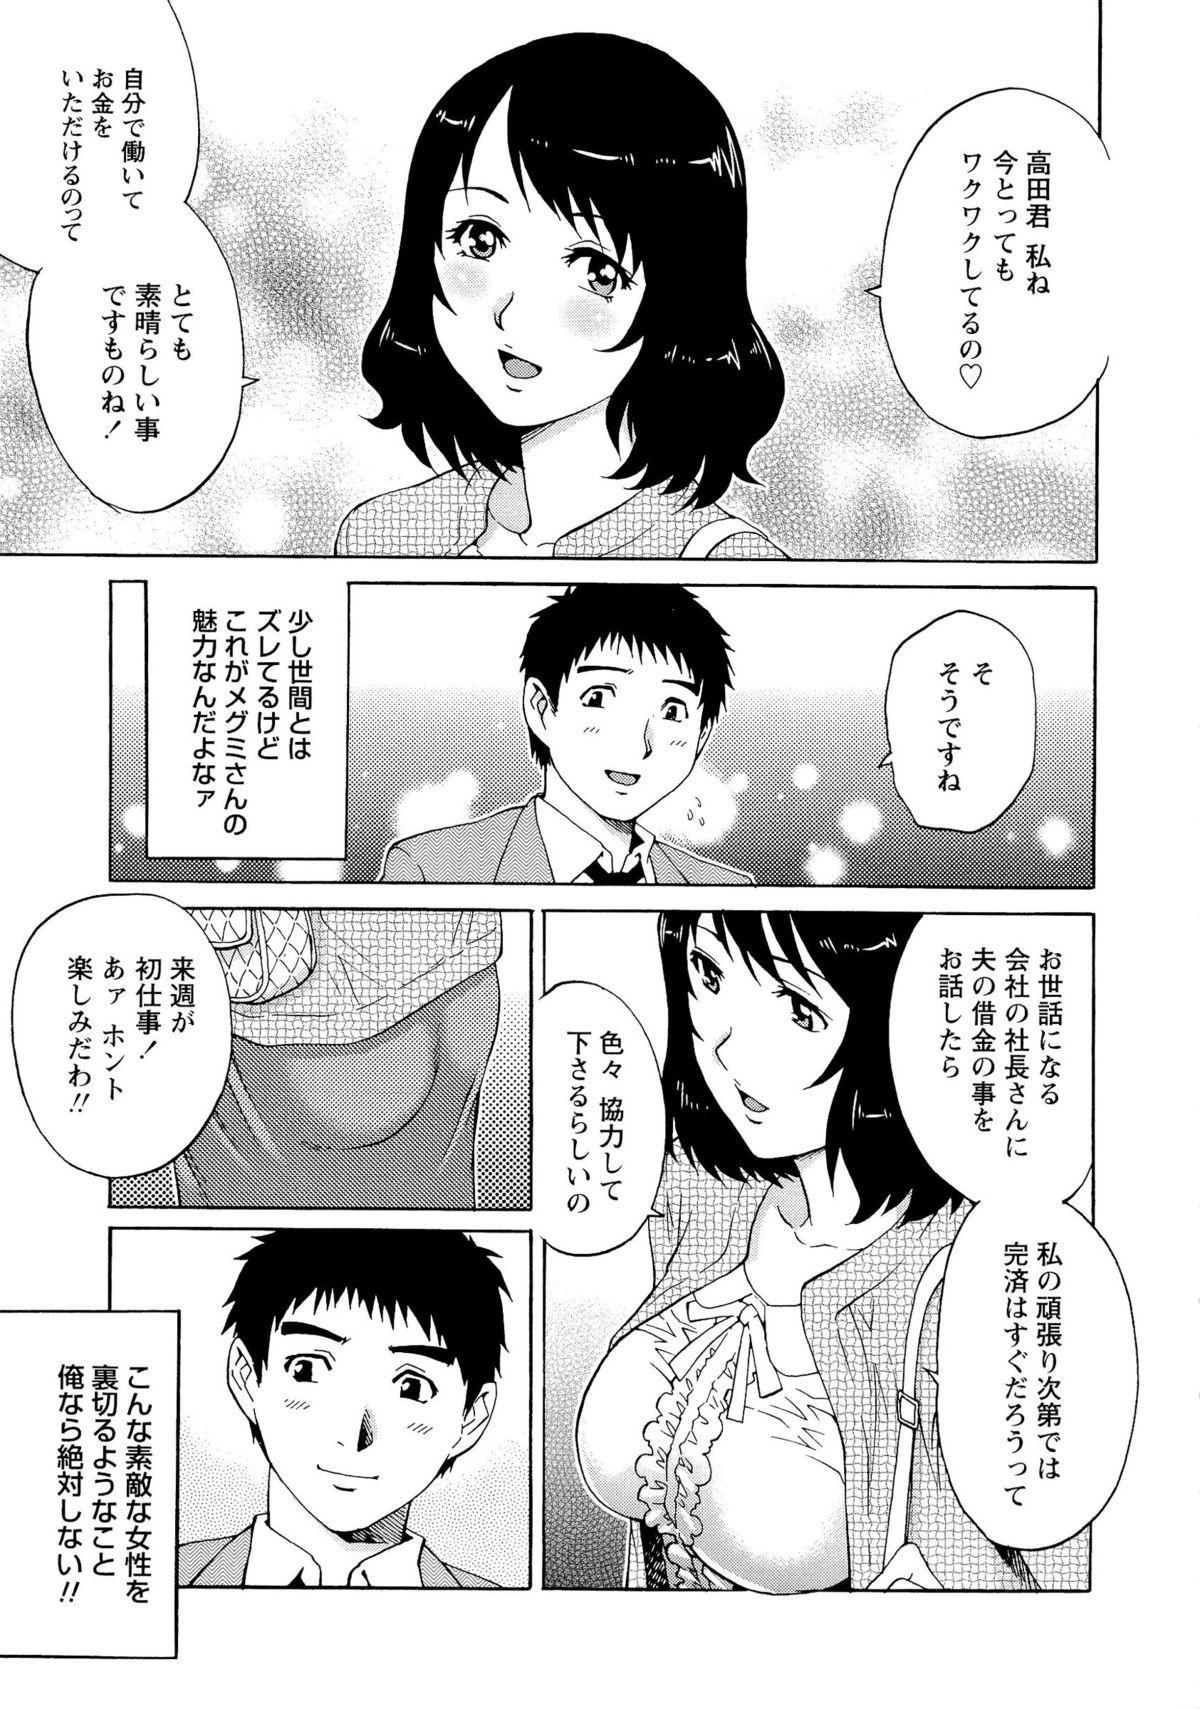 Nureteru Hitozuma - Wetly Wife 167